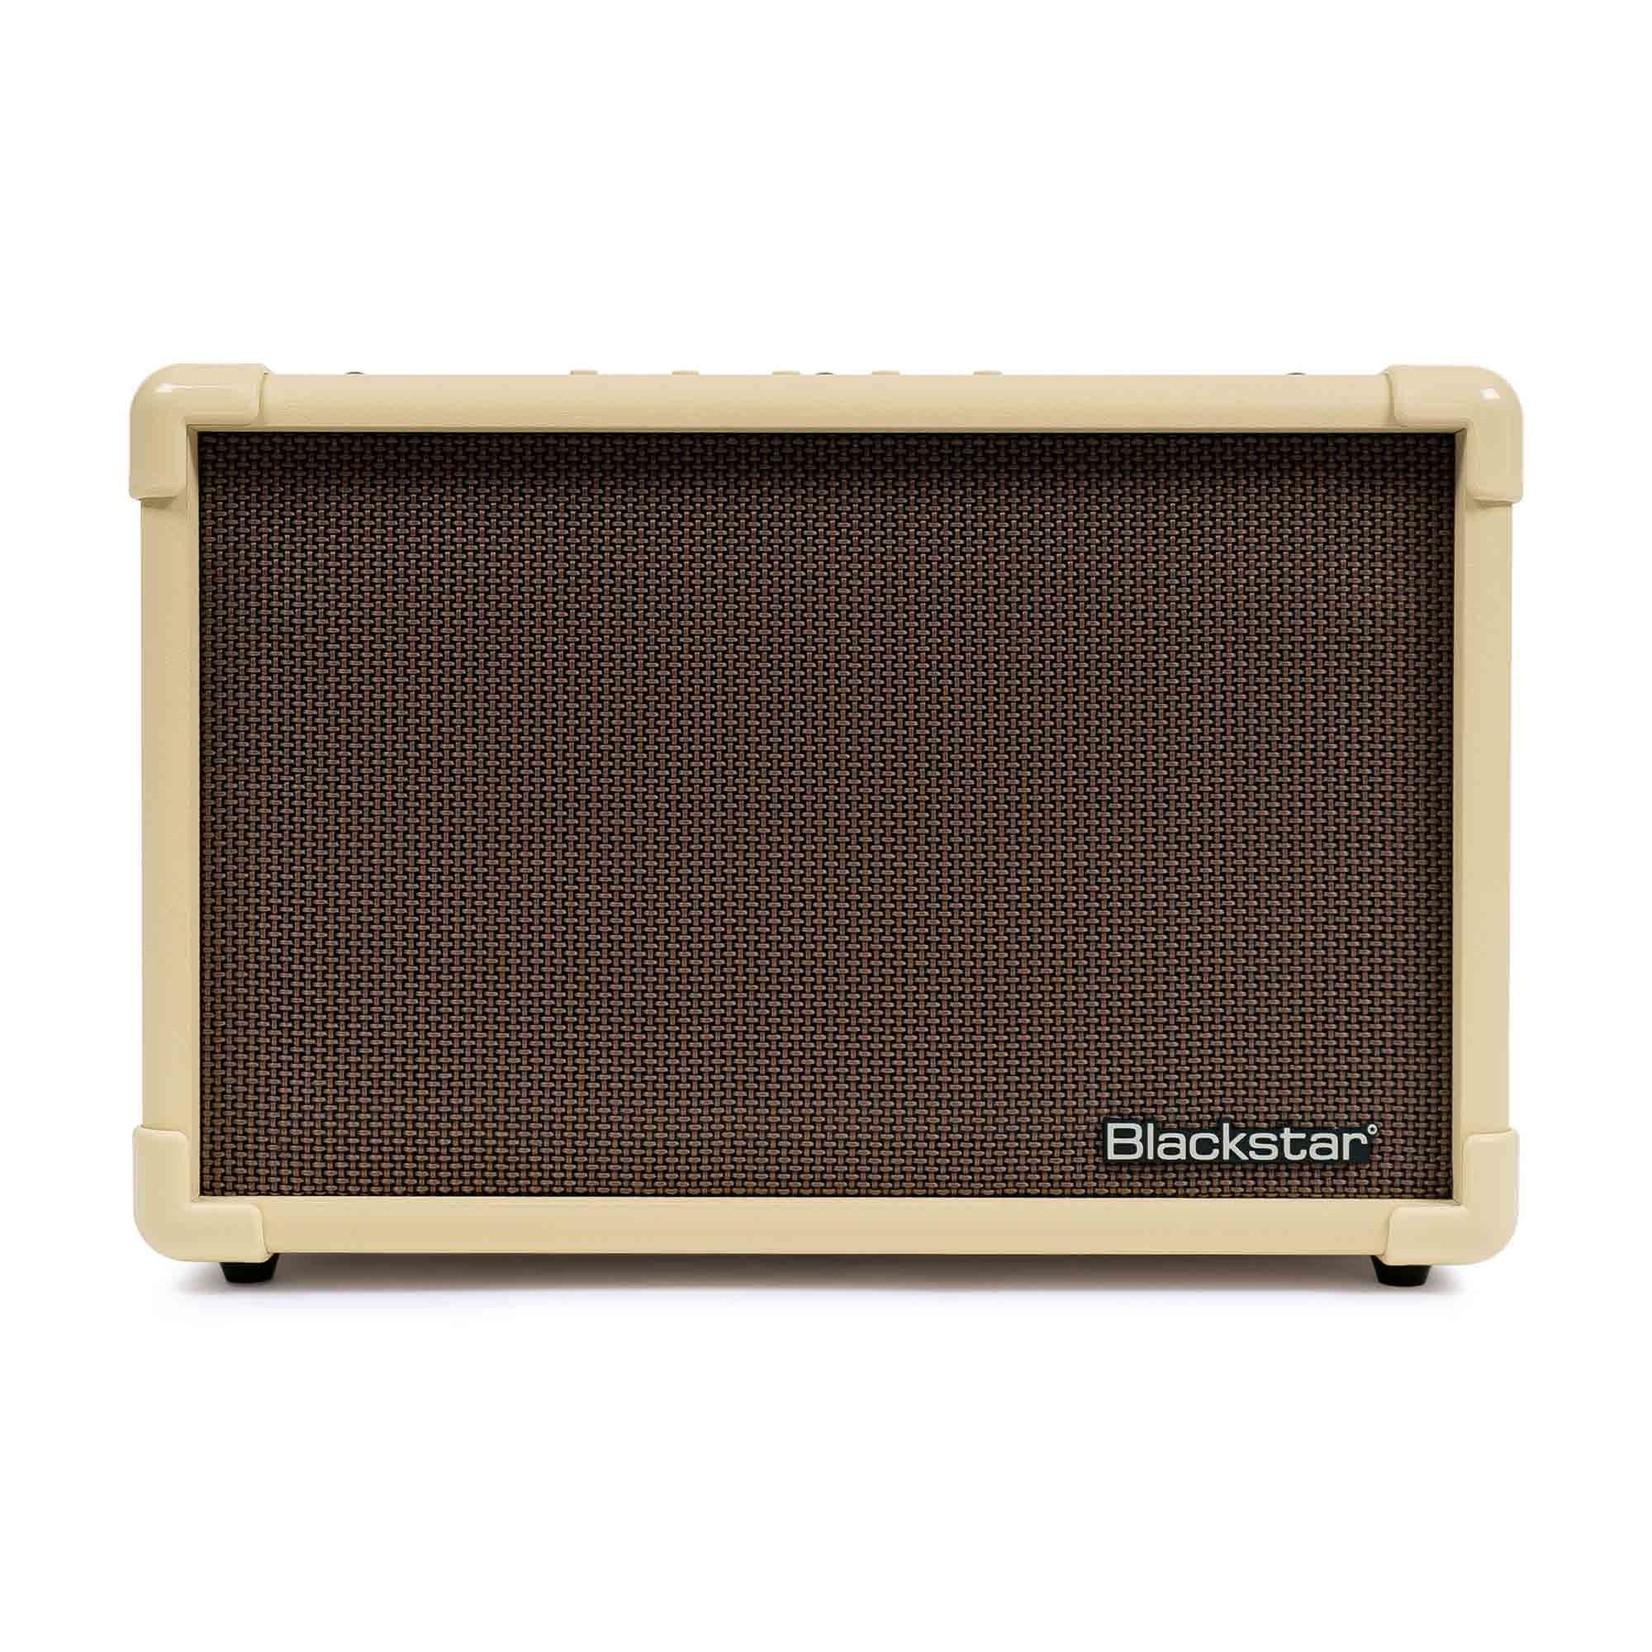 Blackstar Blackstar Acoustic:Core 30W Stereo Acoustic Guitar Amp